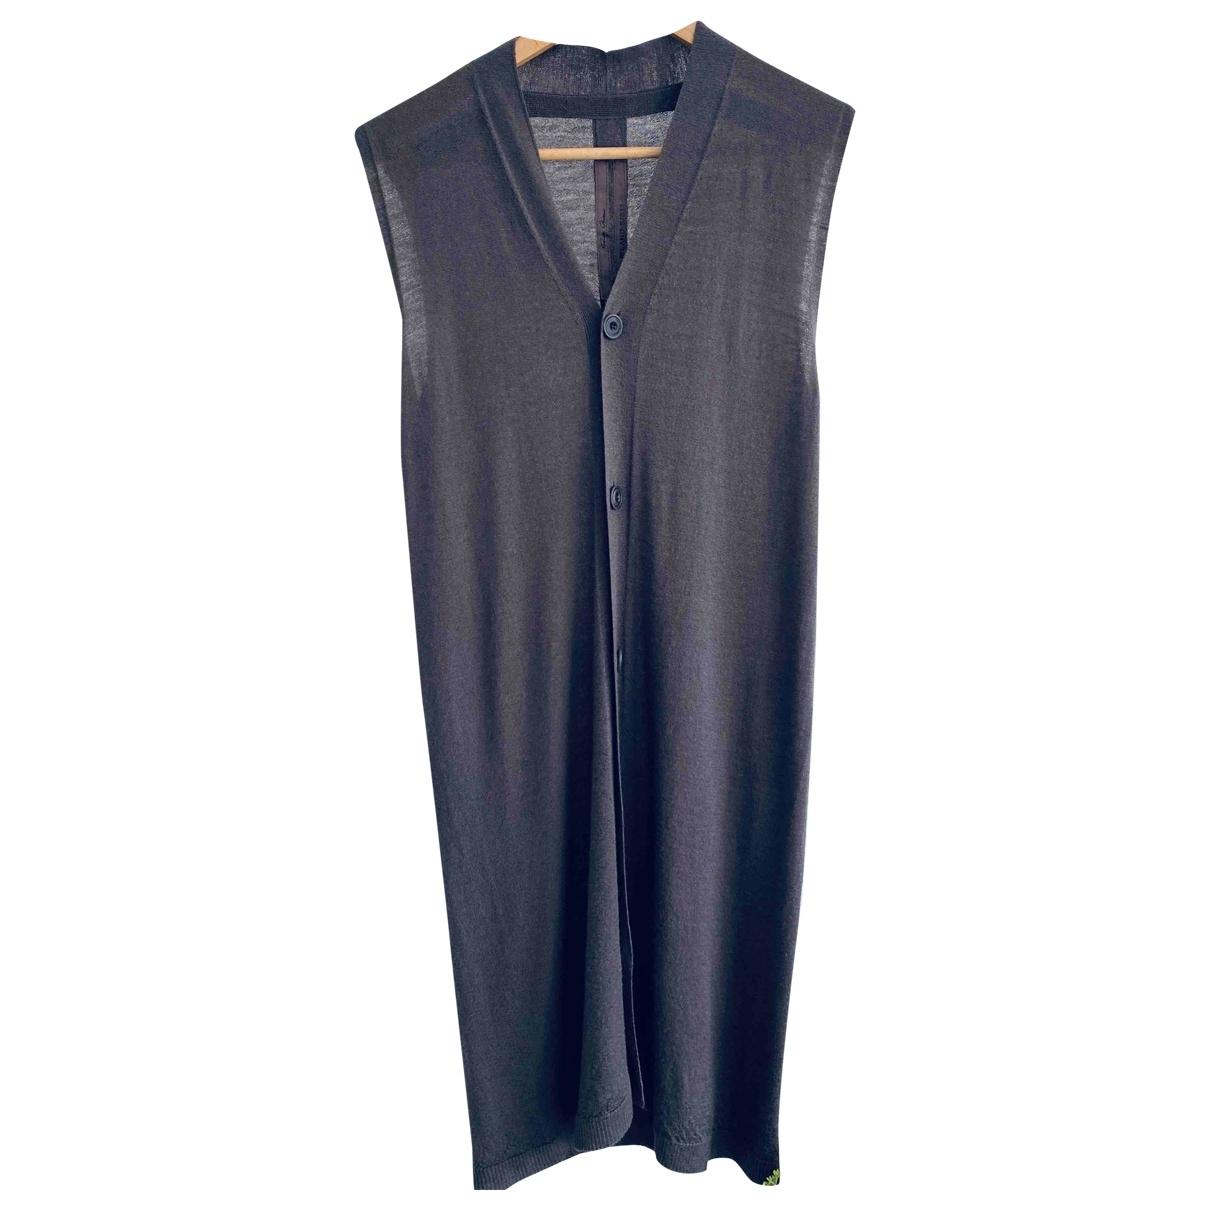 Rick Owens \N Khaki Cashmere Knitwear & Sweatshirts for Men S International